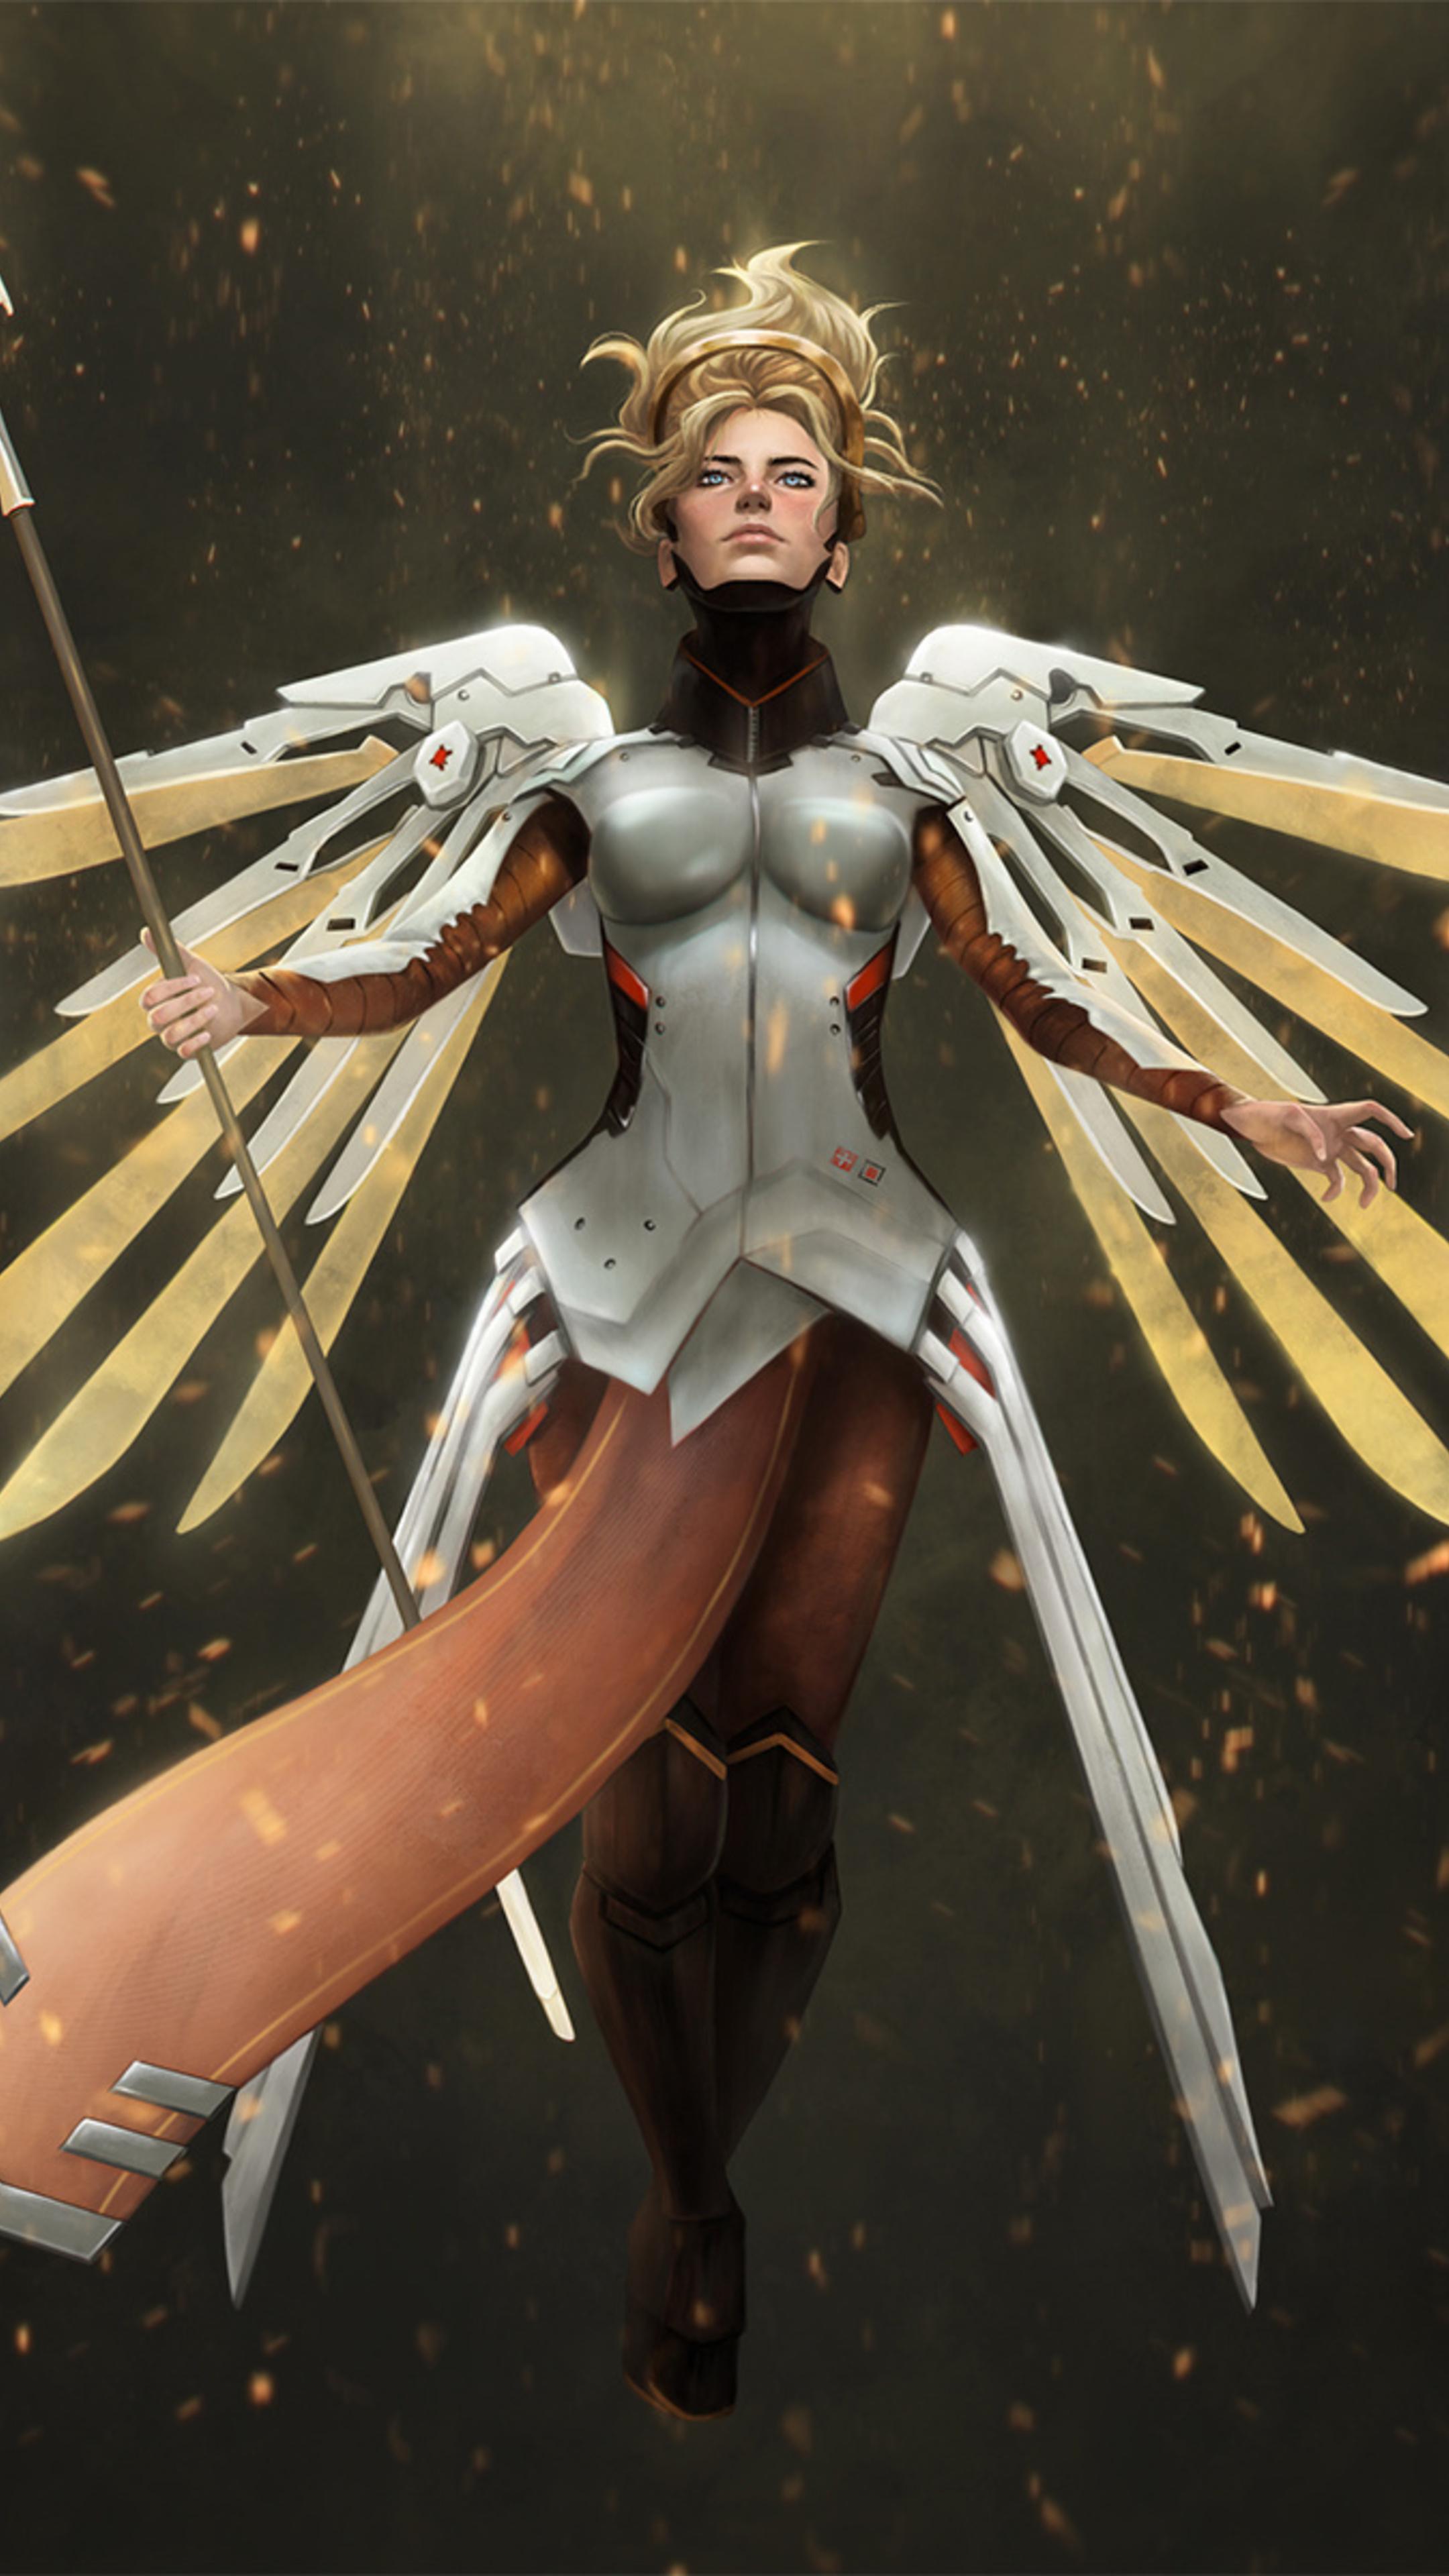 mercy-overwatch-art-hd-le.jpg